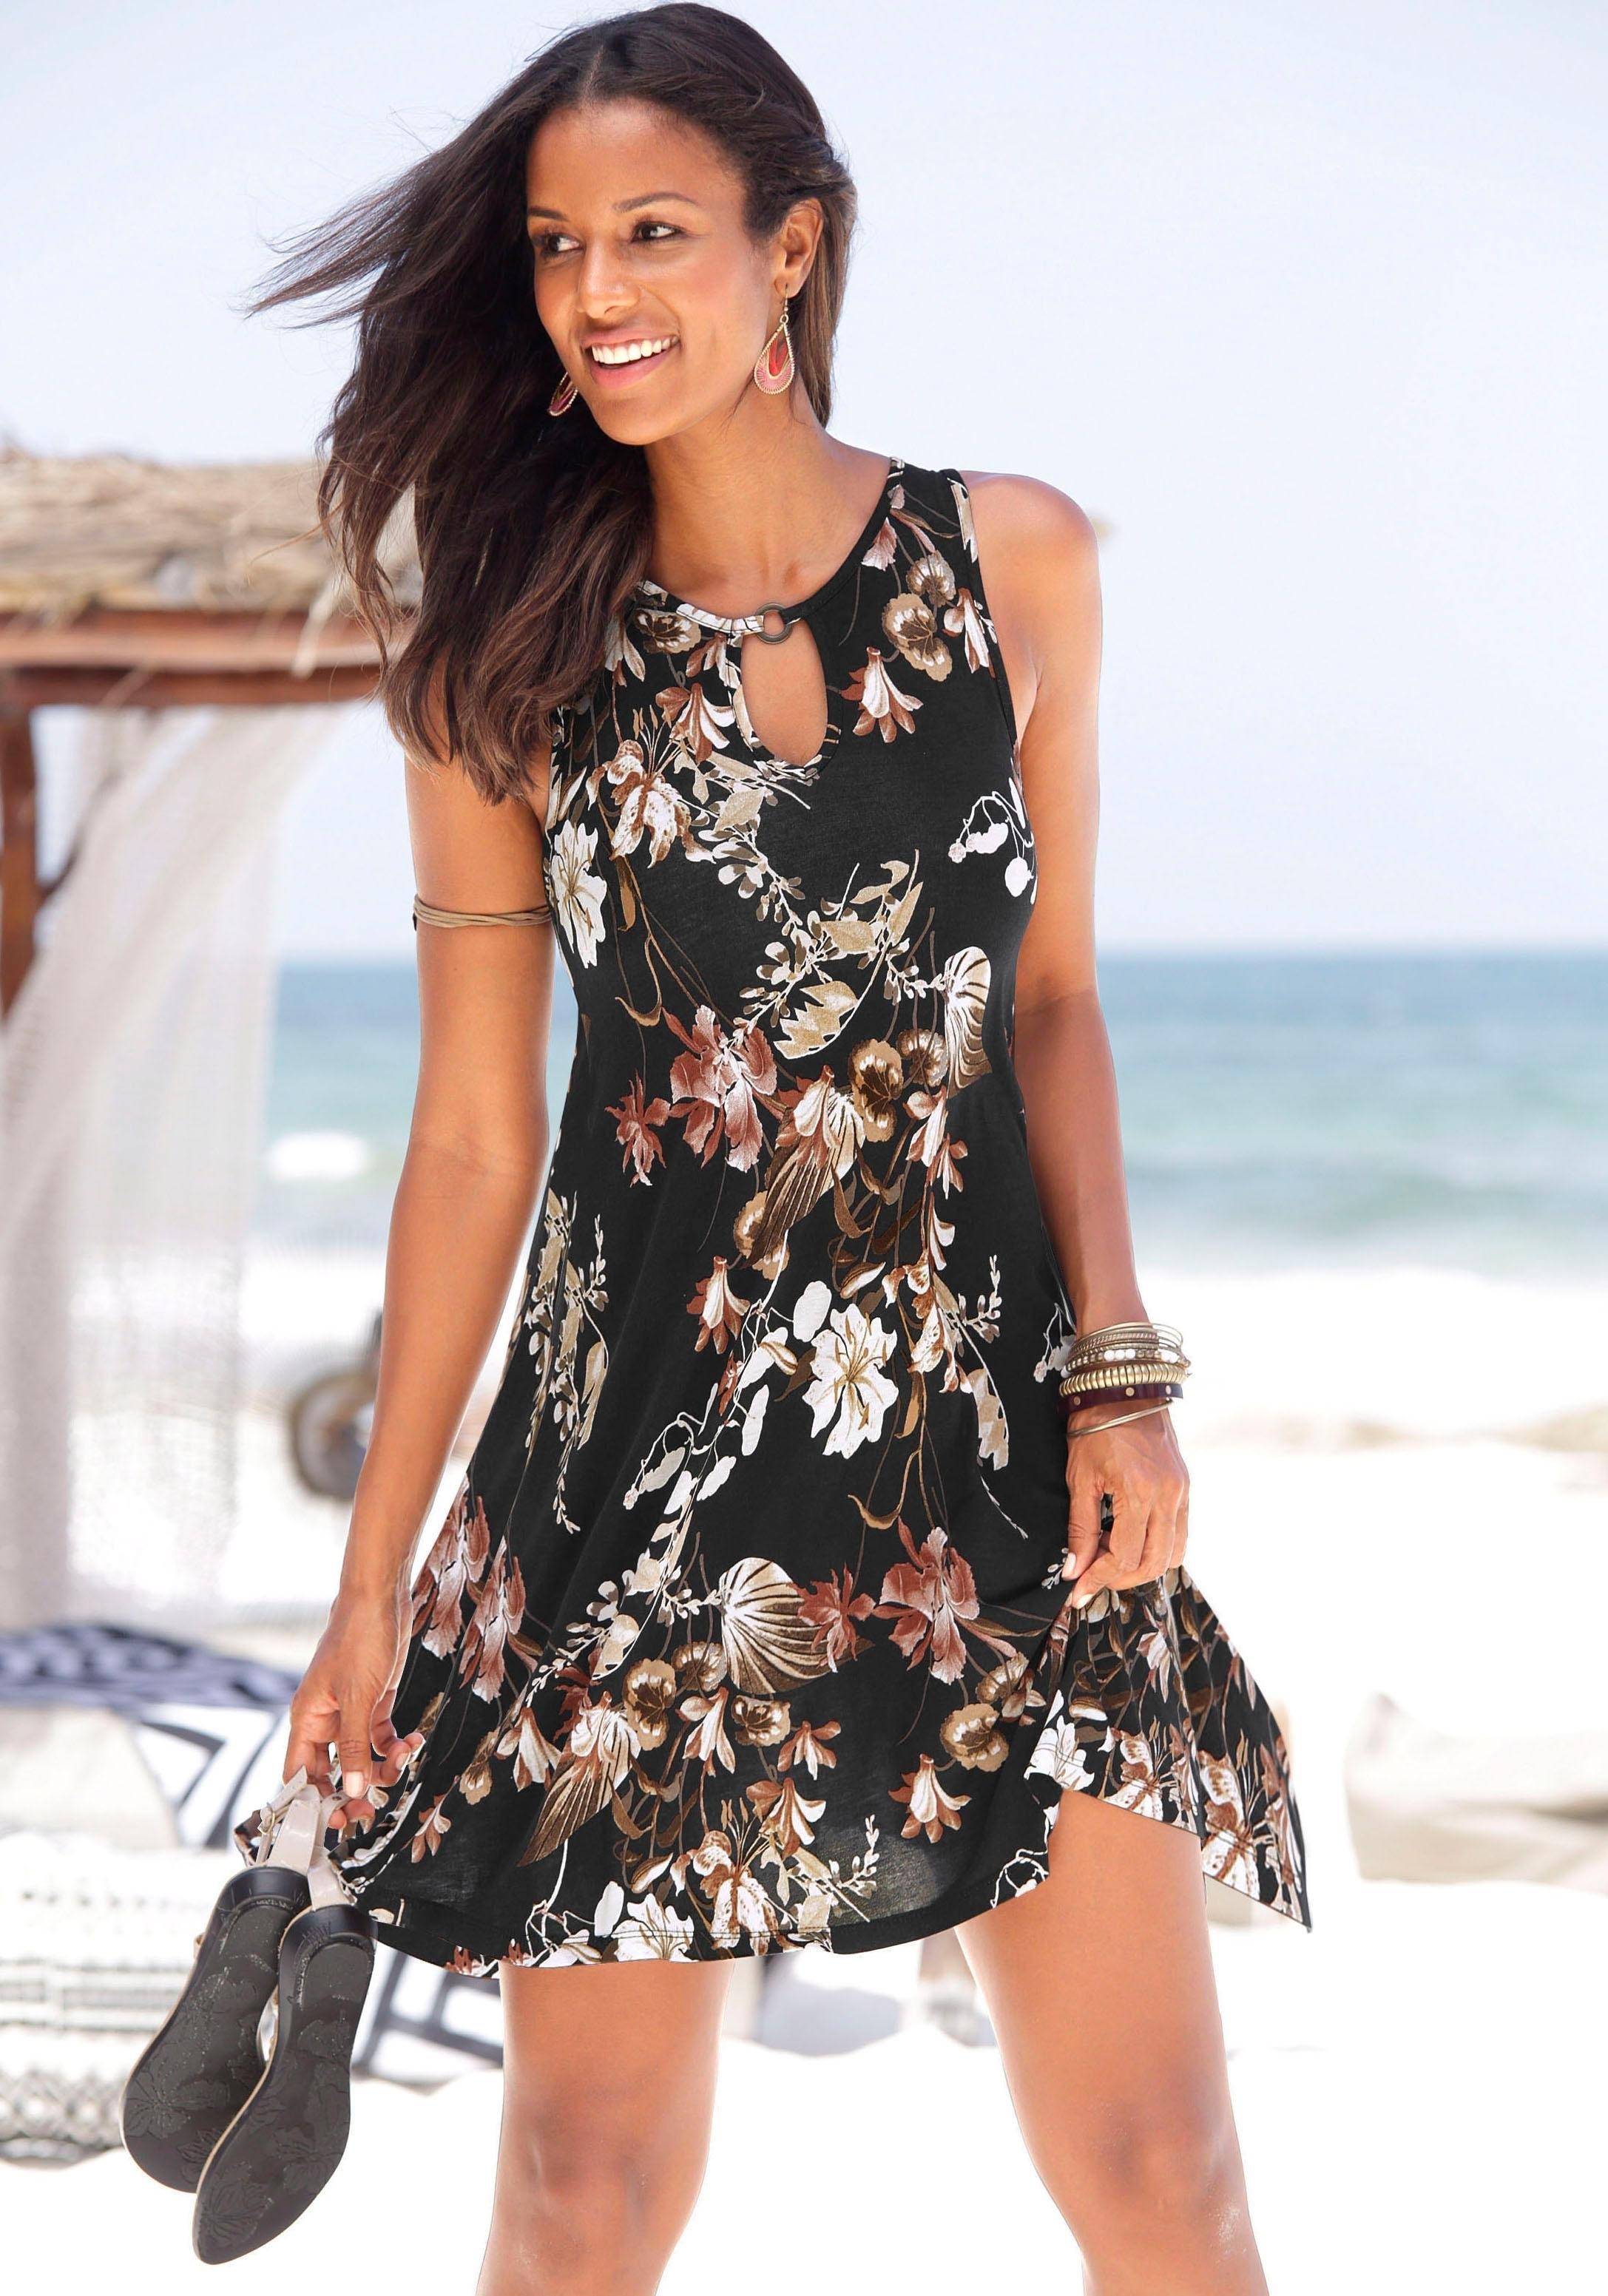 LASCANA jurk online kopen op lascana.nl